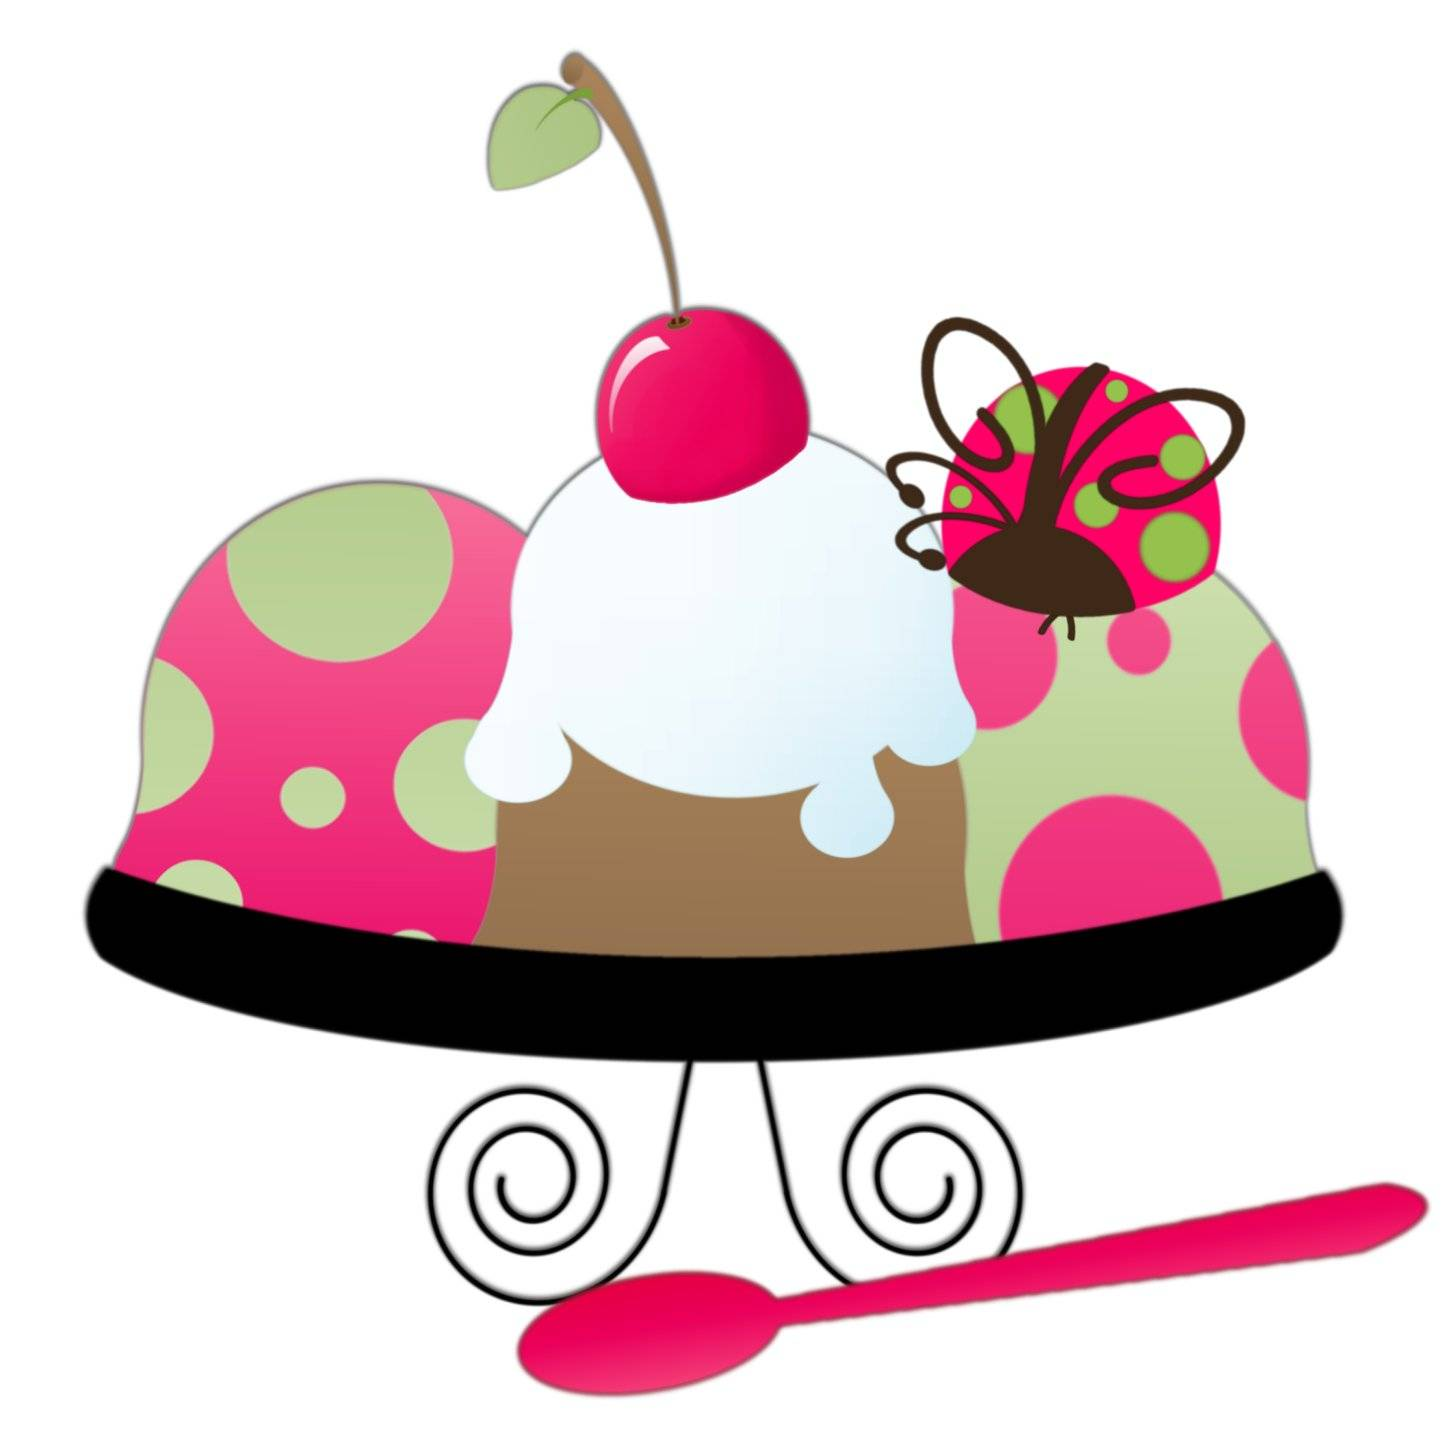 1456x1436 Ice Cream Sundae Clipart Free Images 6